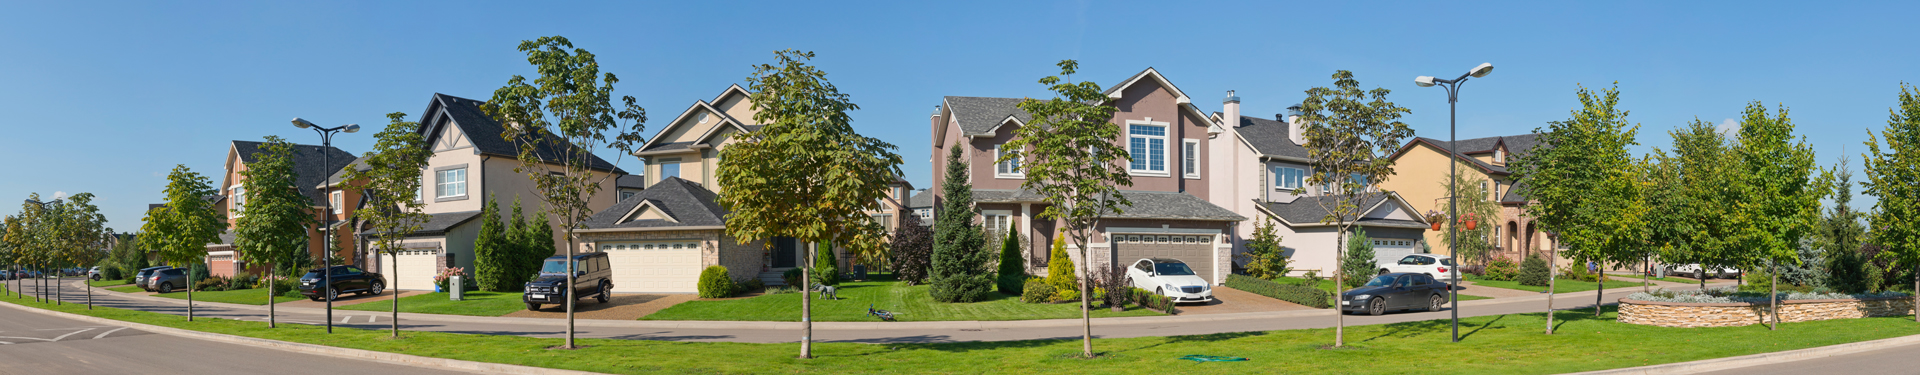 Home-Auto-Insurance-Ohio